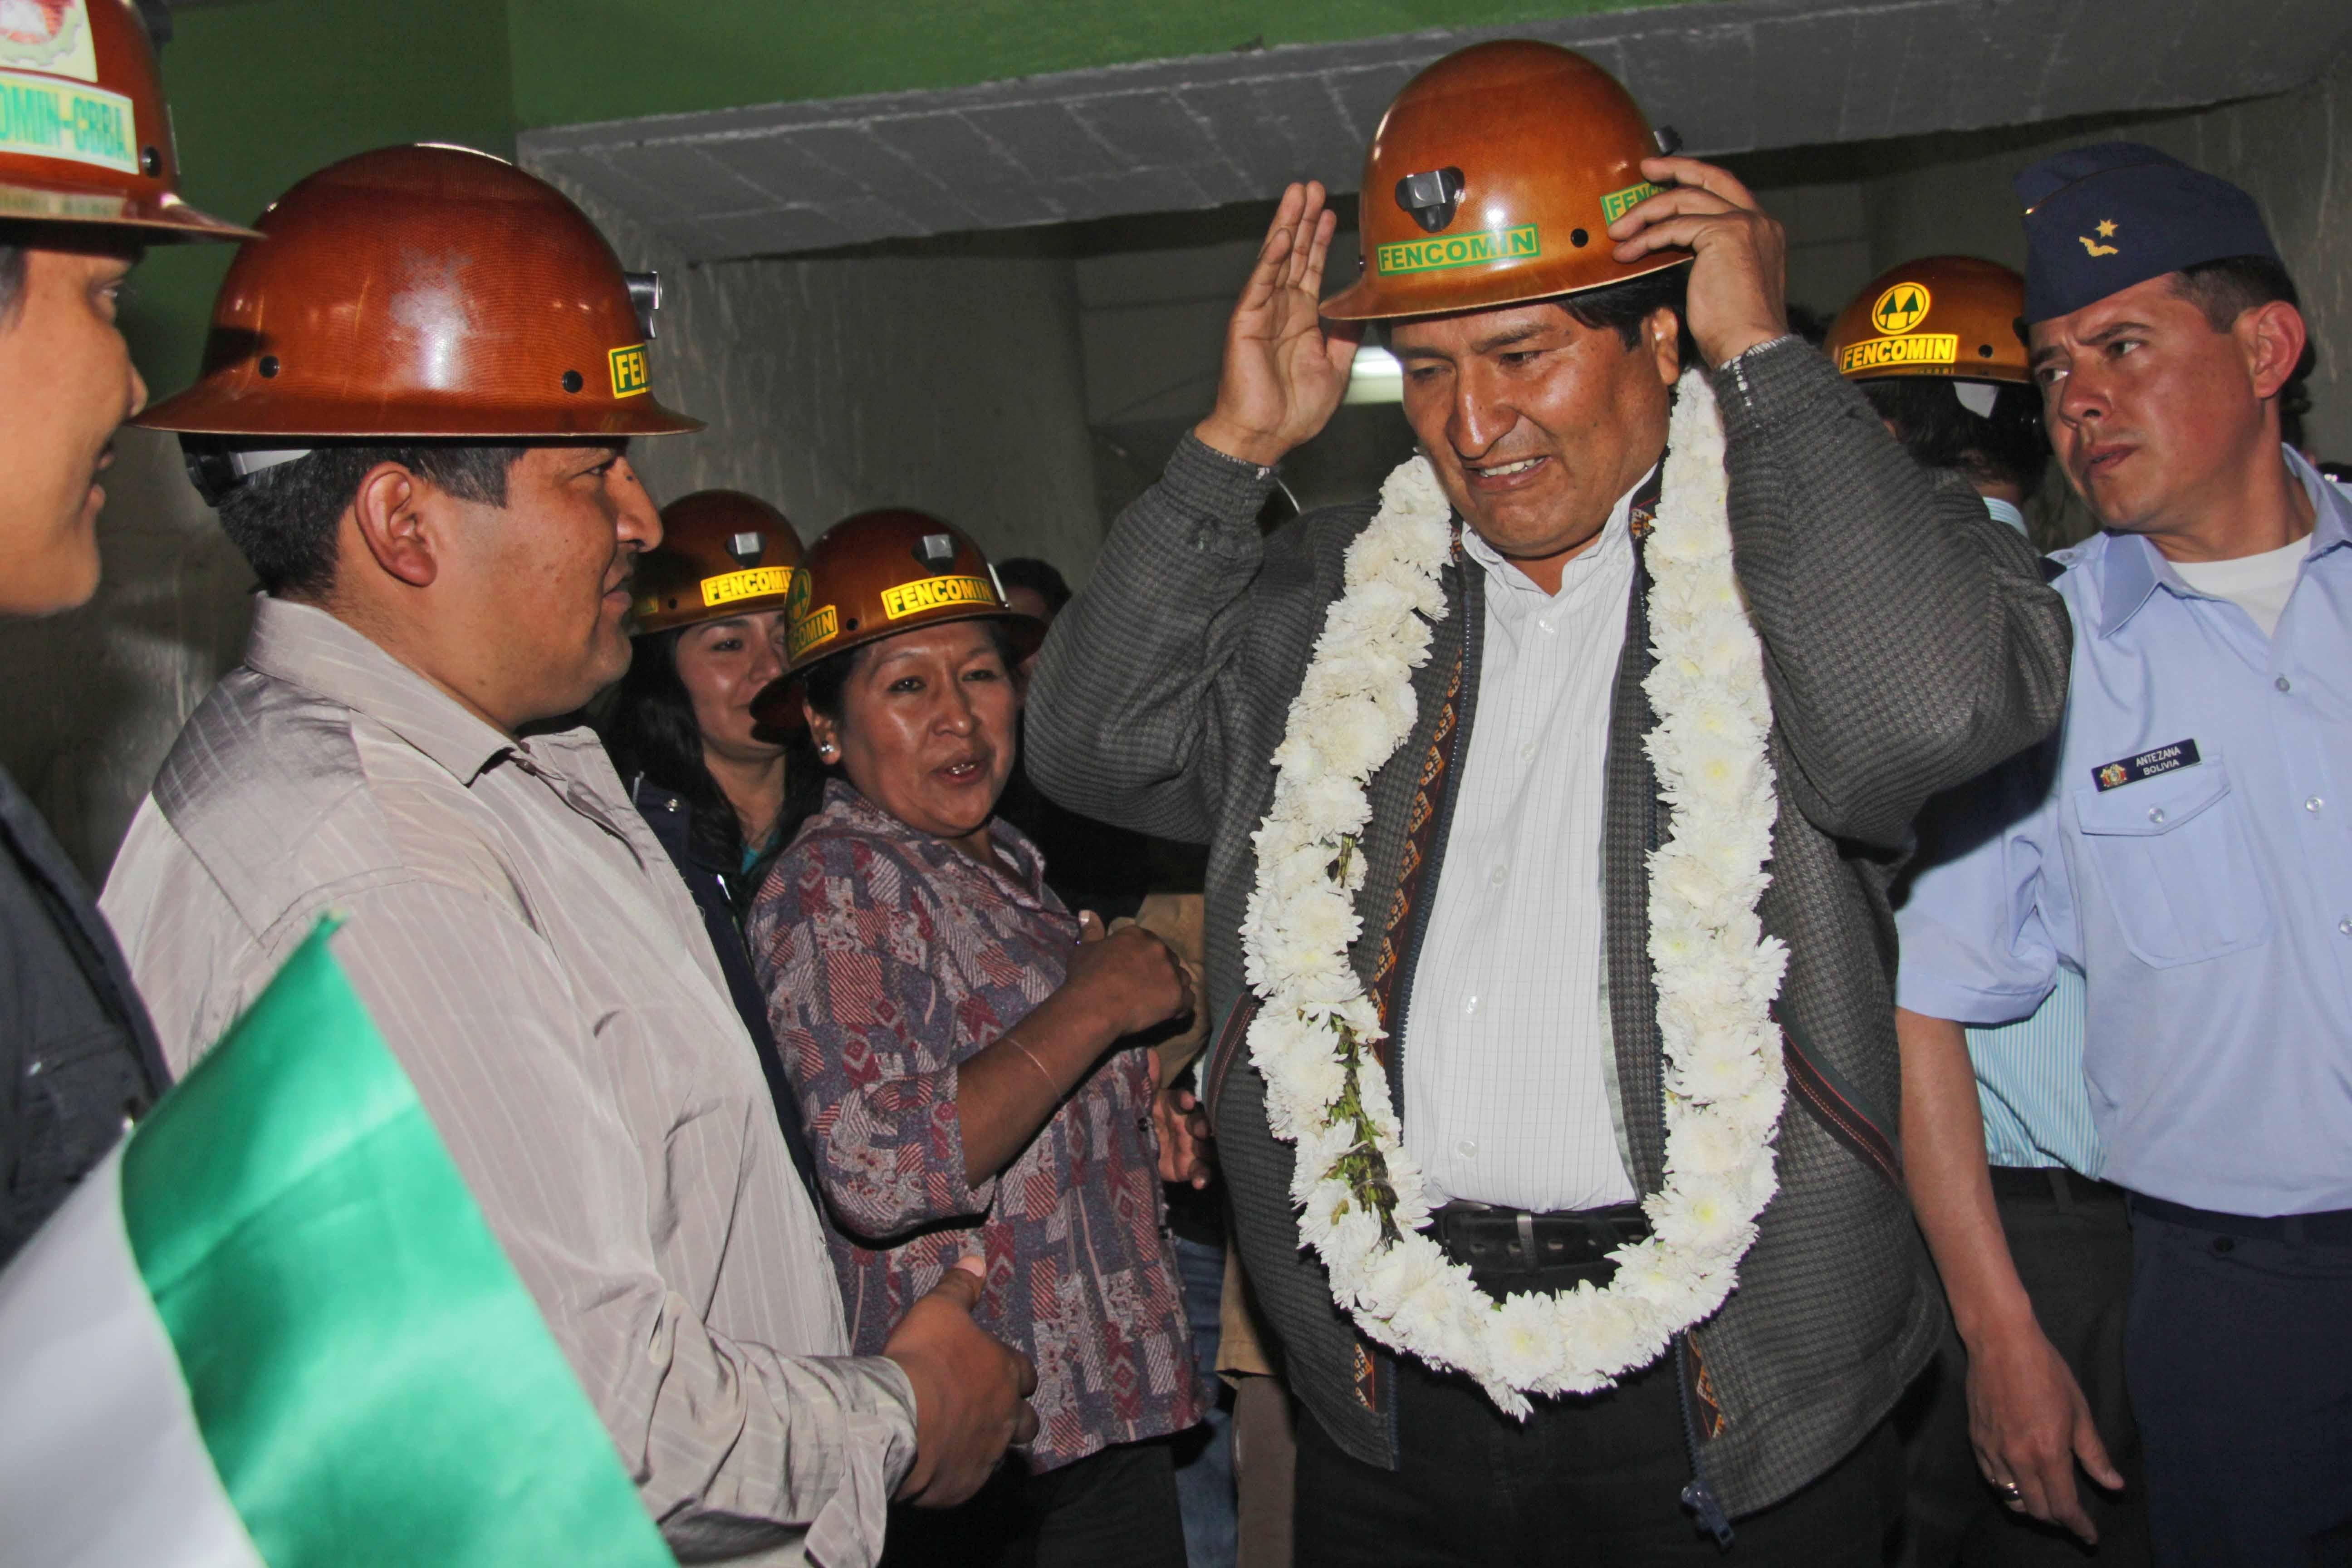 China donates 200 dump trucks to Bolivian miners - Xinhua | English.news.cn